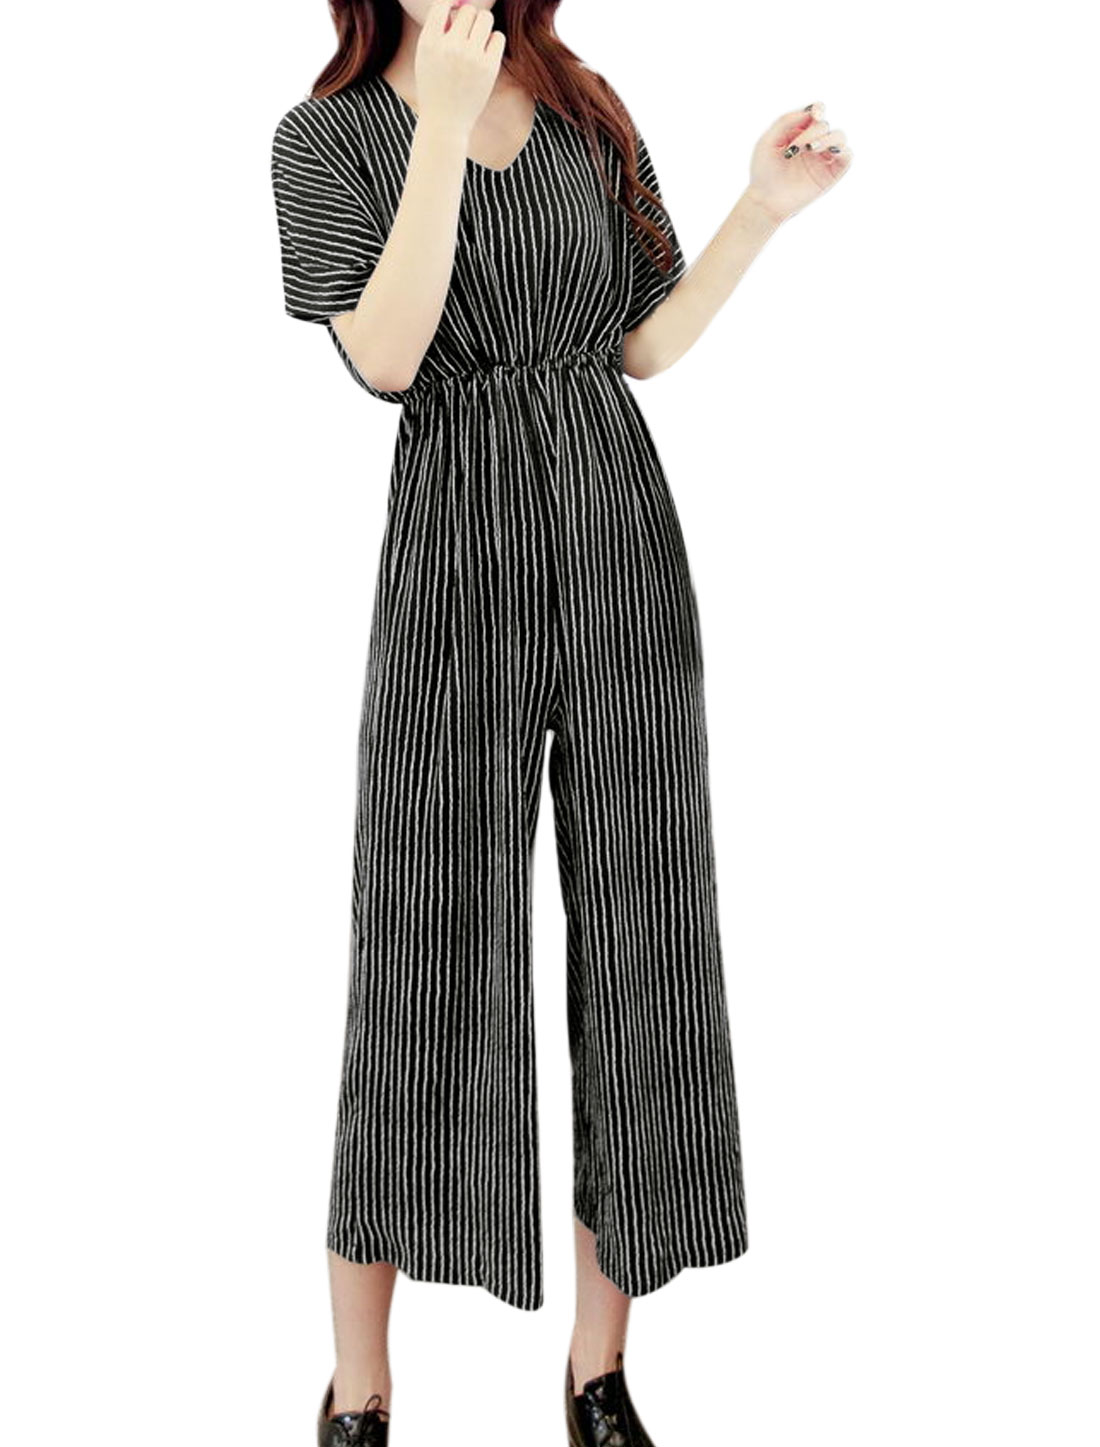 Women Batwing Sleeves Stripes Wide Leg Capris Jumpsuit Black XS